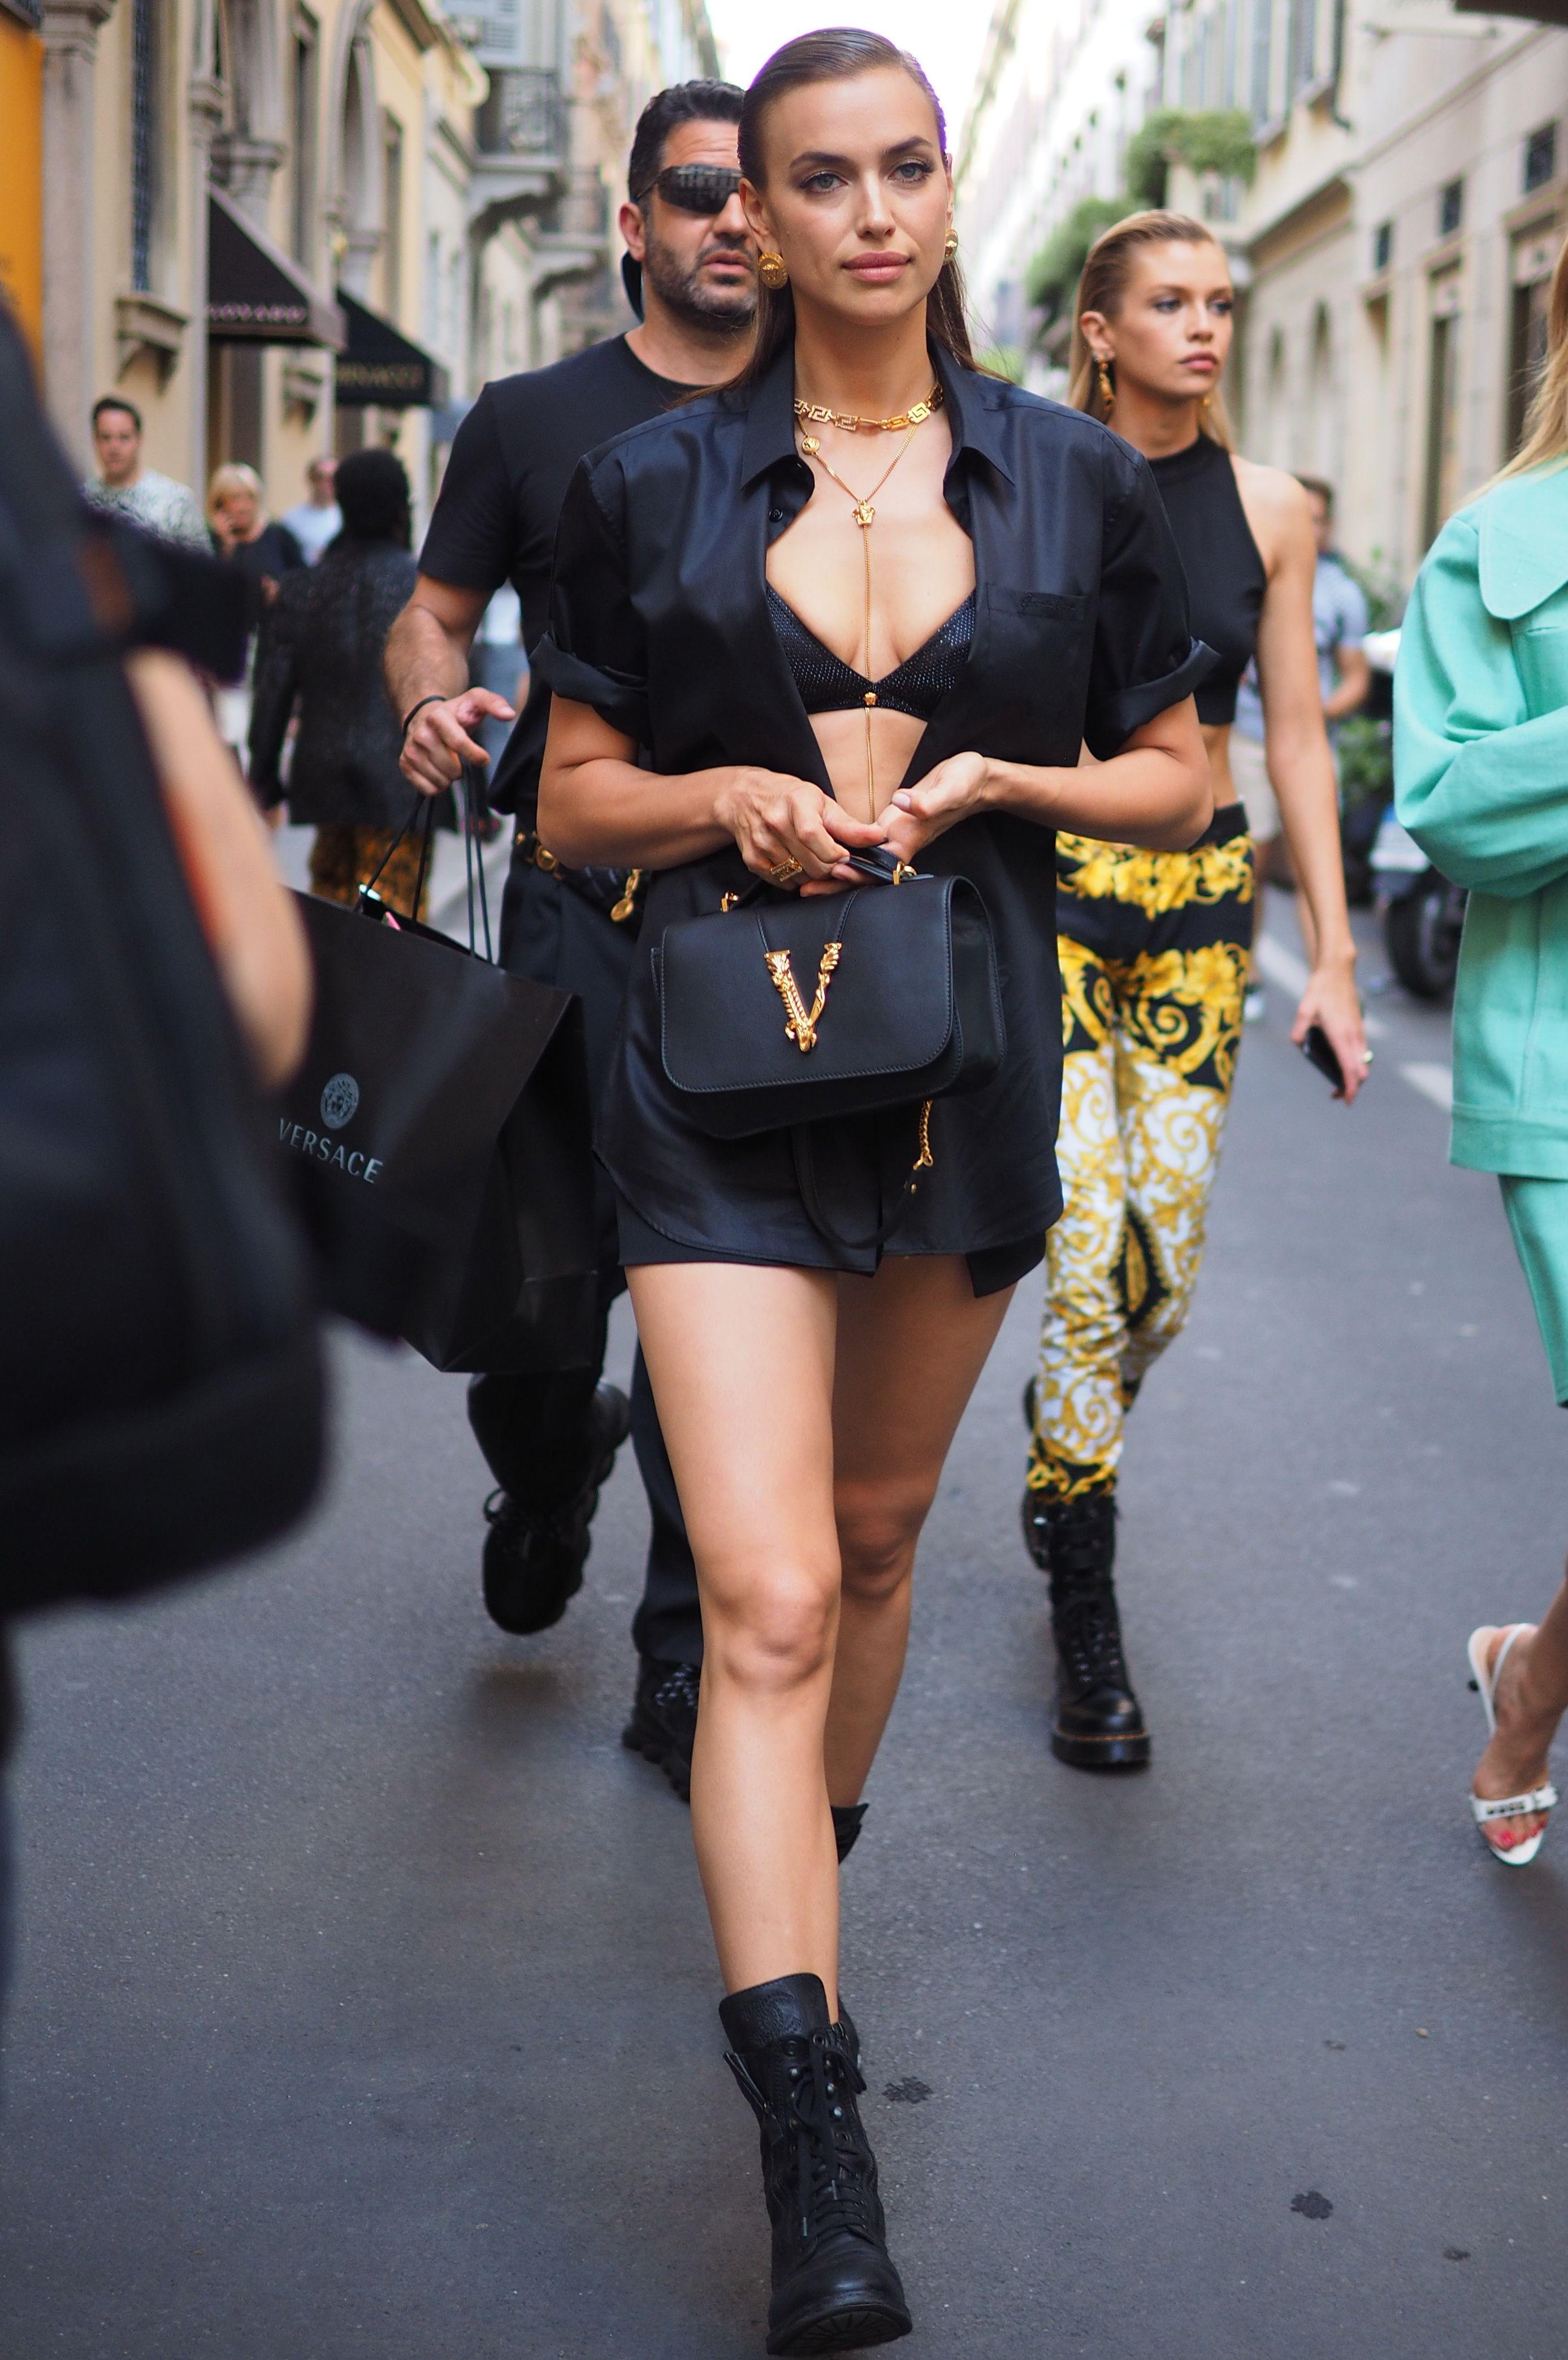 Irina Shayk in the street in open dress